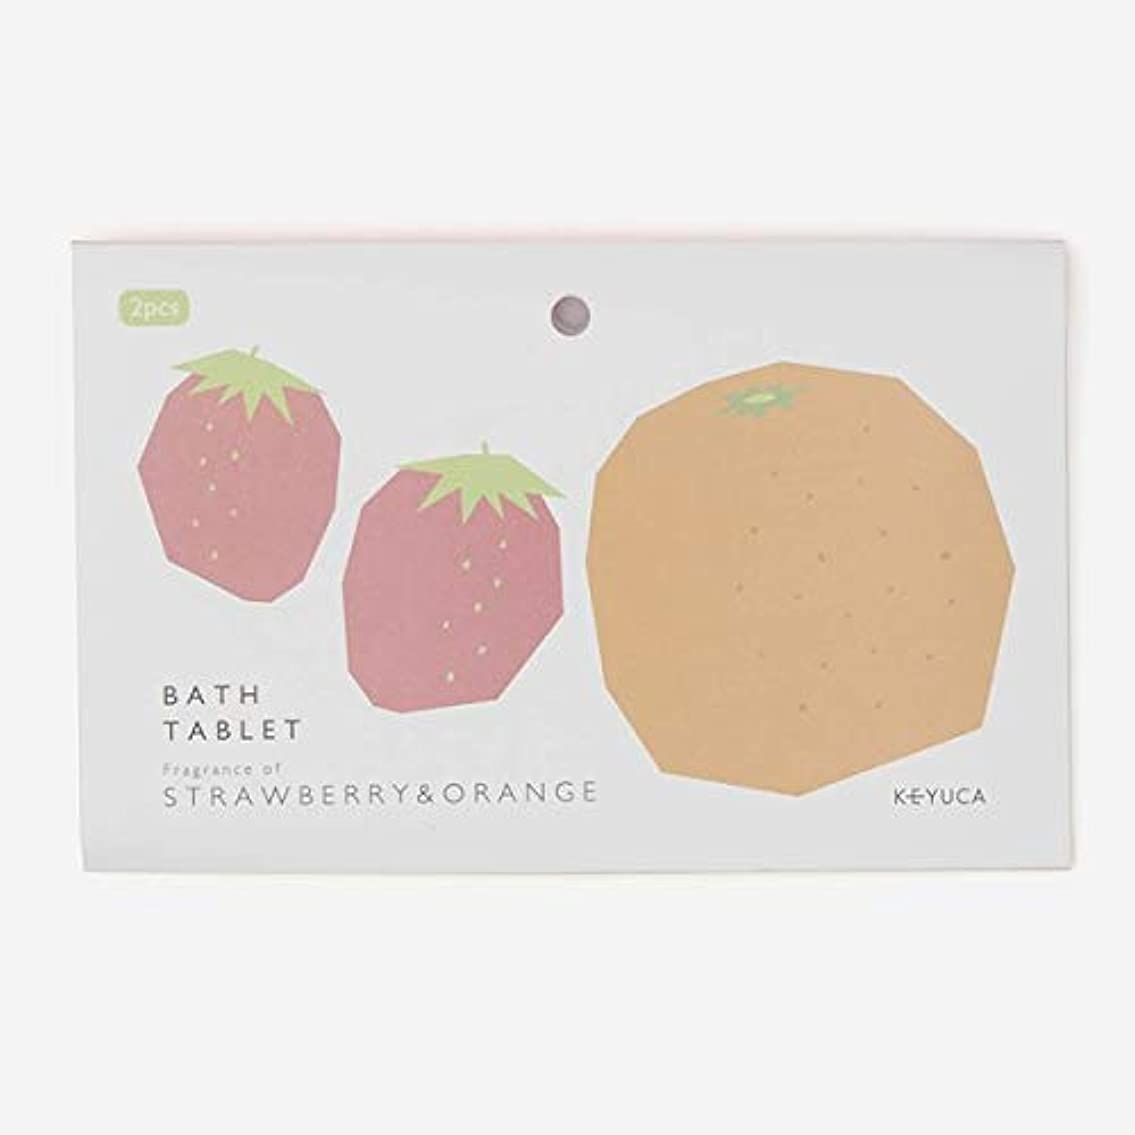 KEYUCA(ケユカ) バスタブレット 2個入 ストロベリー&オレンジ